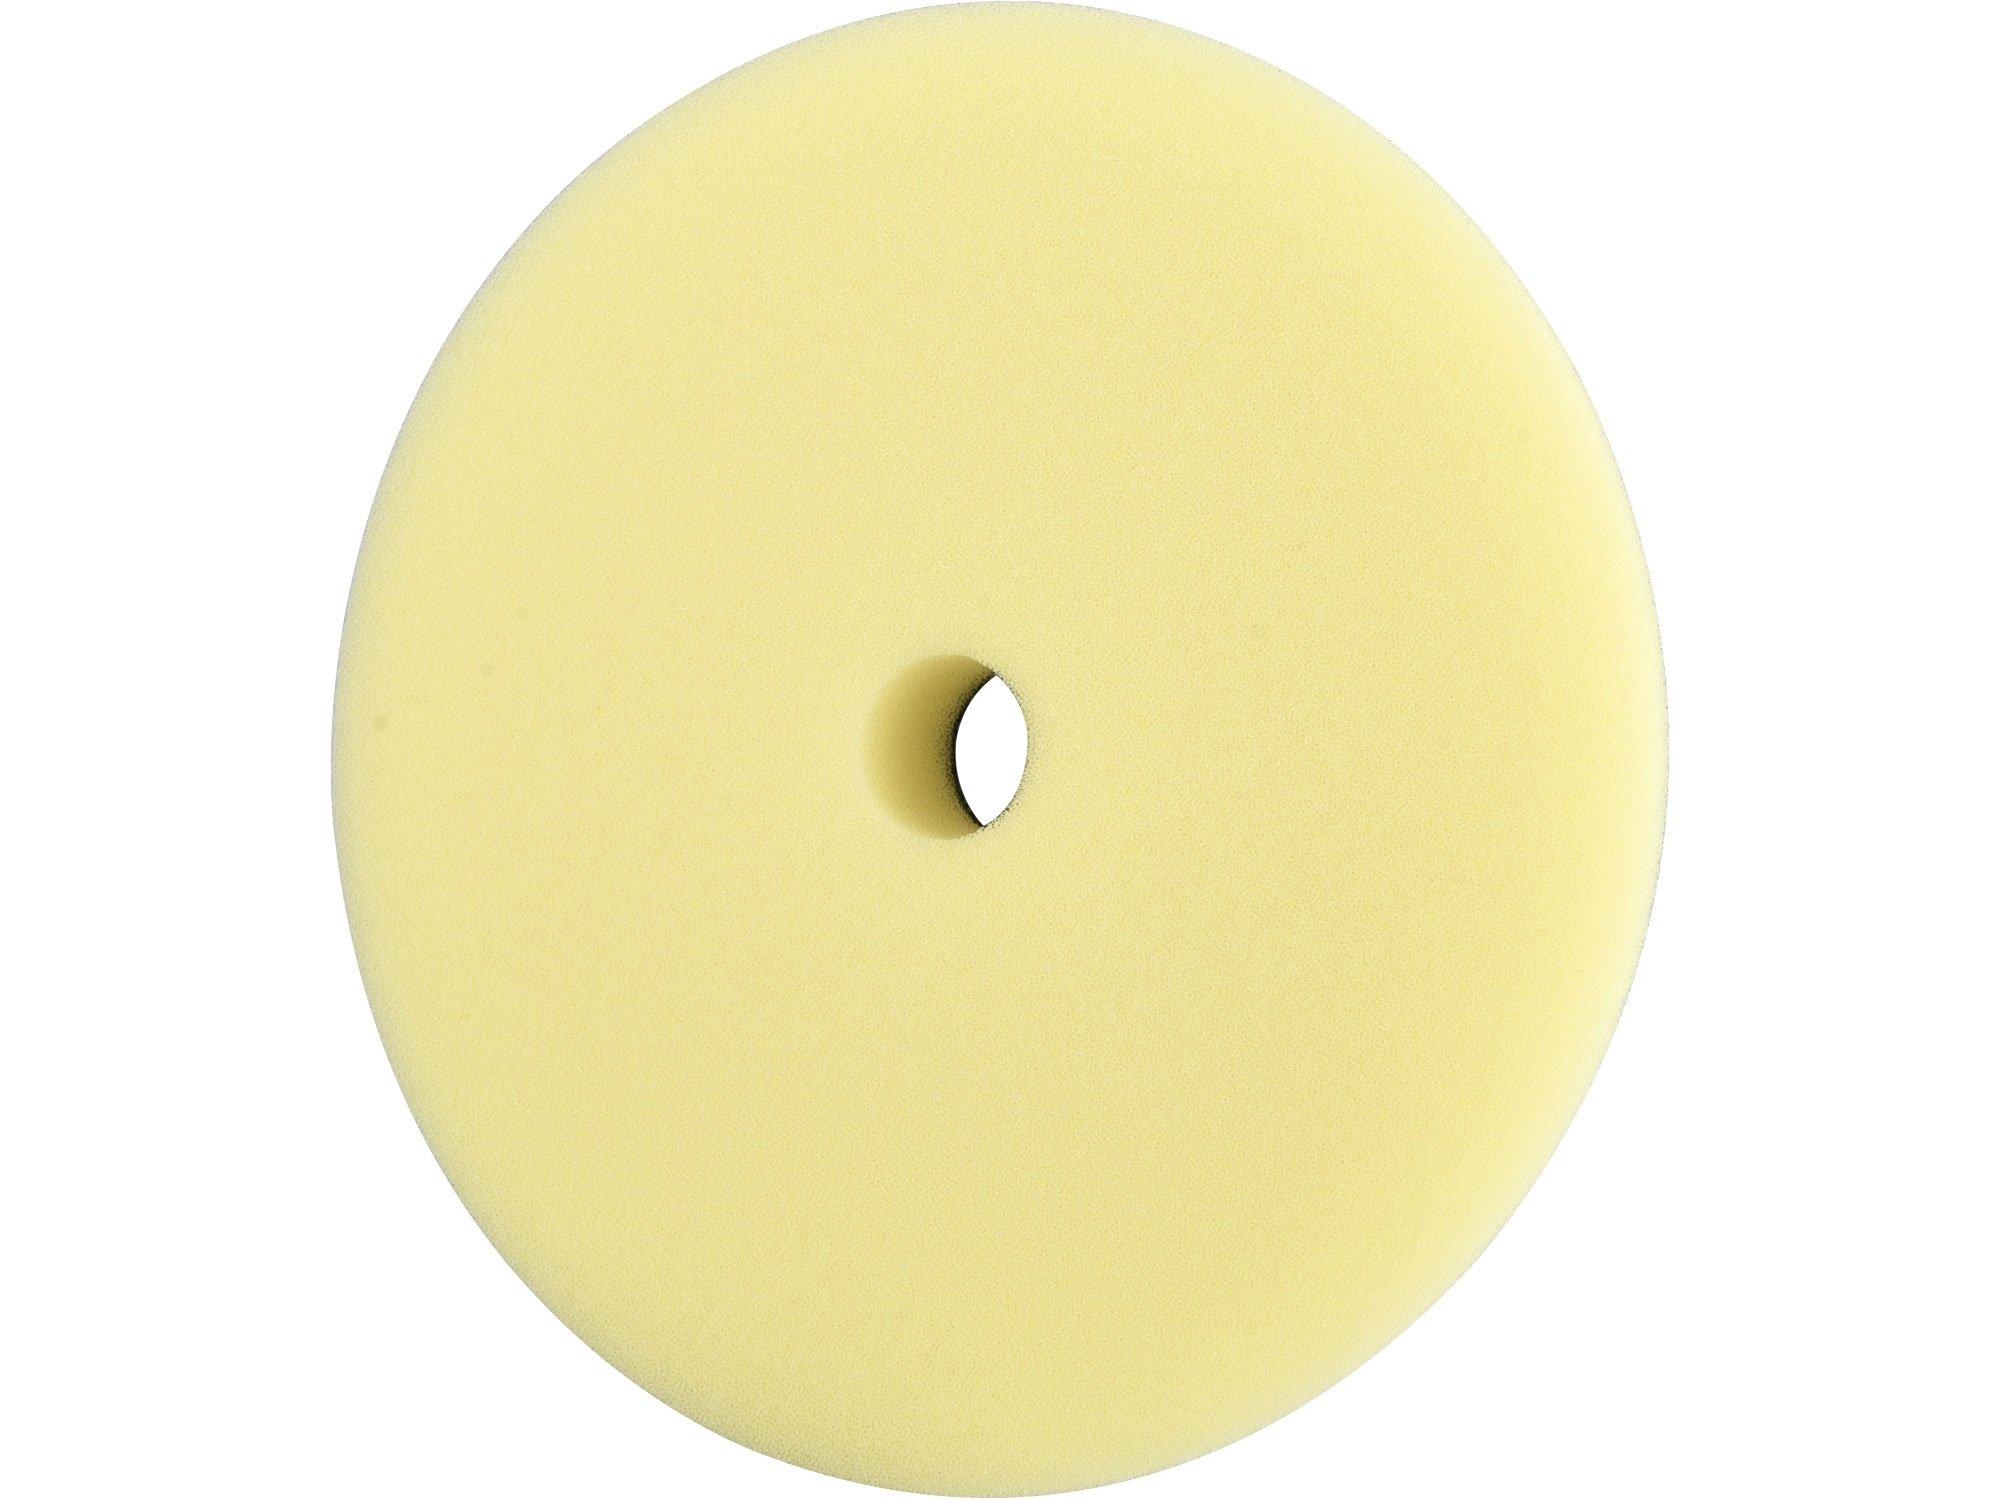 Kotouč lešticí pěnový na suchý zip T80 Extol Premium - 8804558 180mm